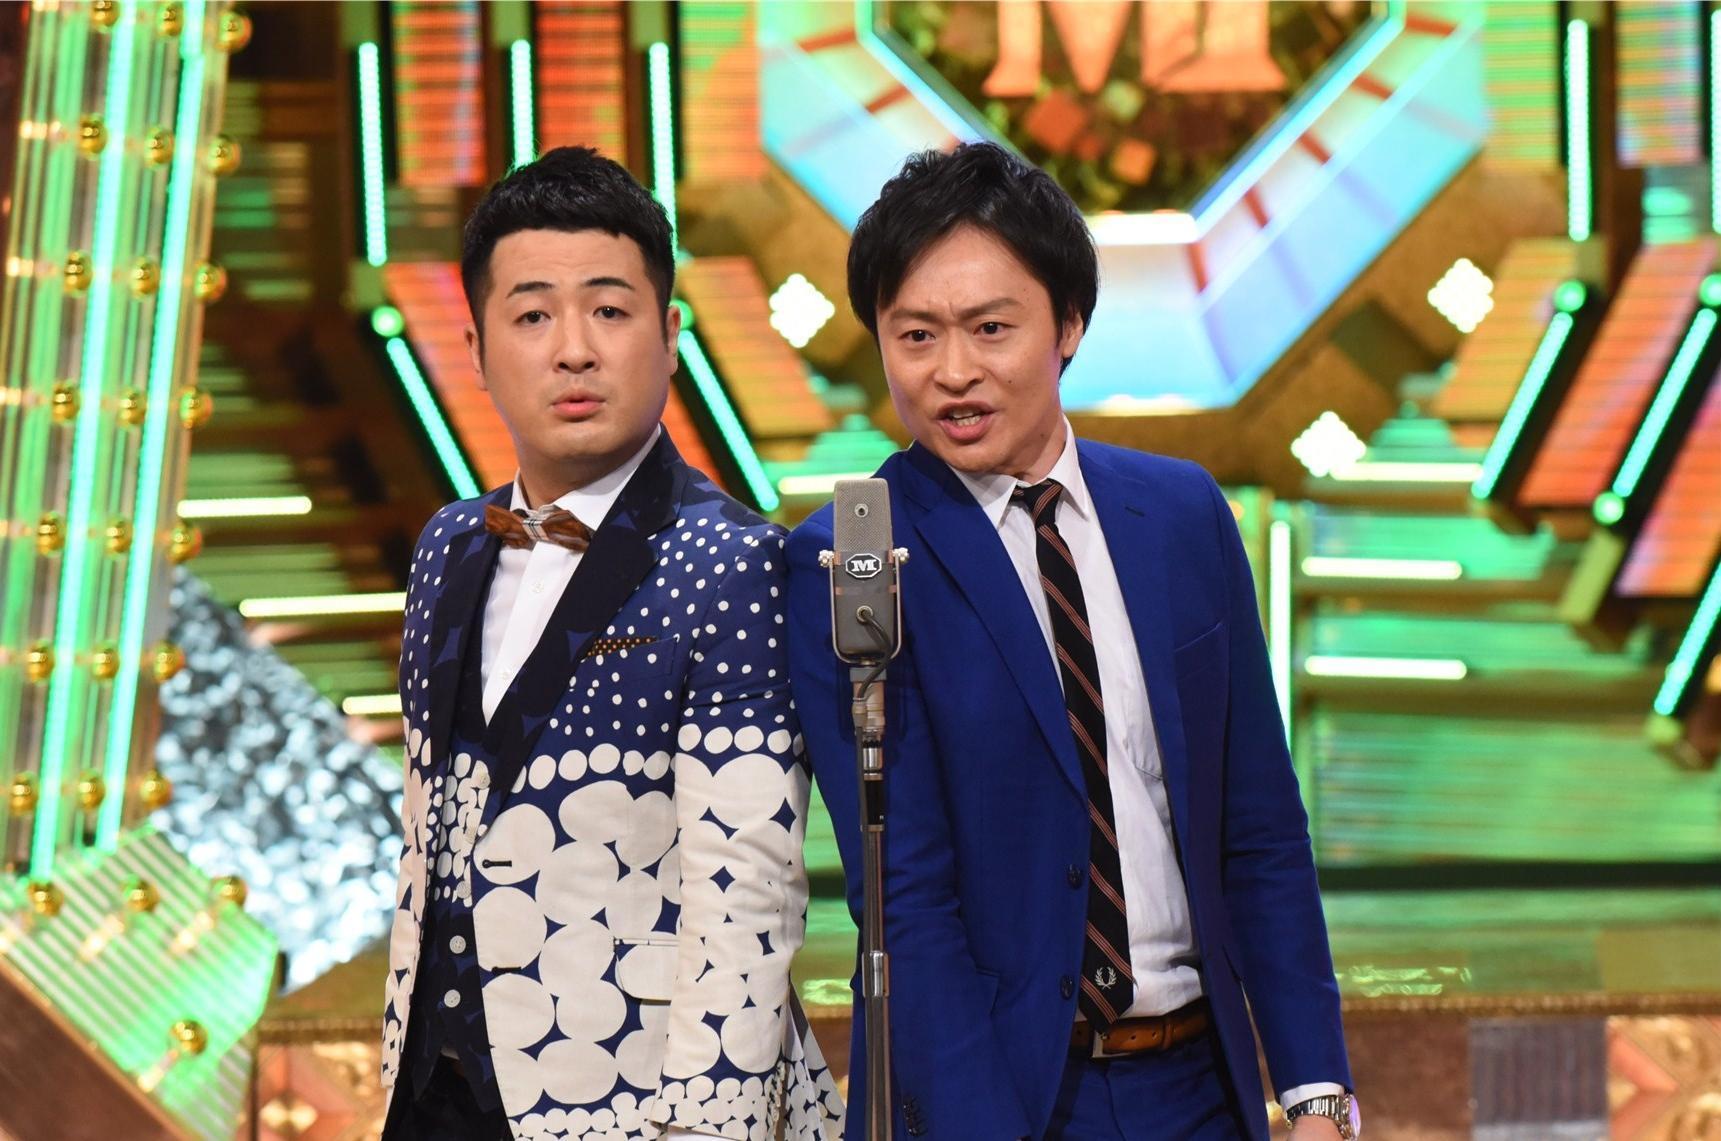 http://news.yoshimoto.co.jp/20171204151025-913f33b75b2dc946312b7da847725e86800d5348.jpg